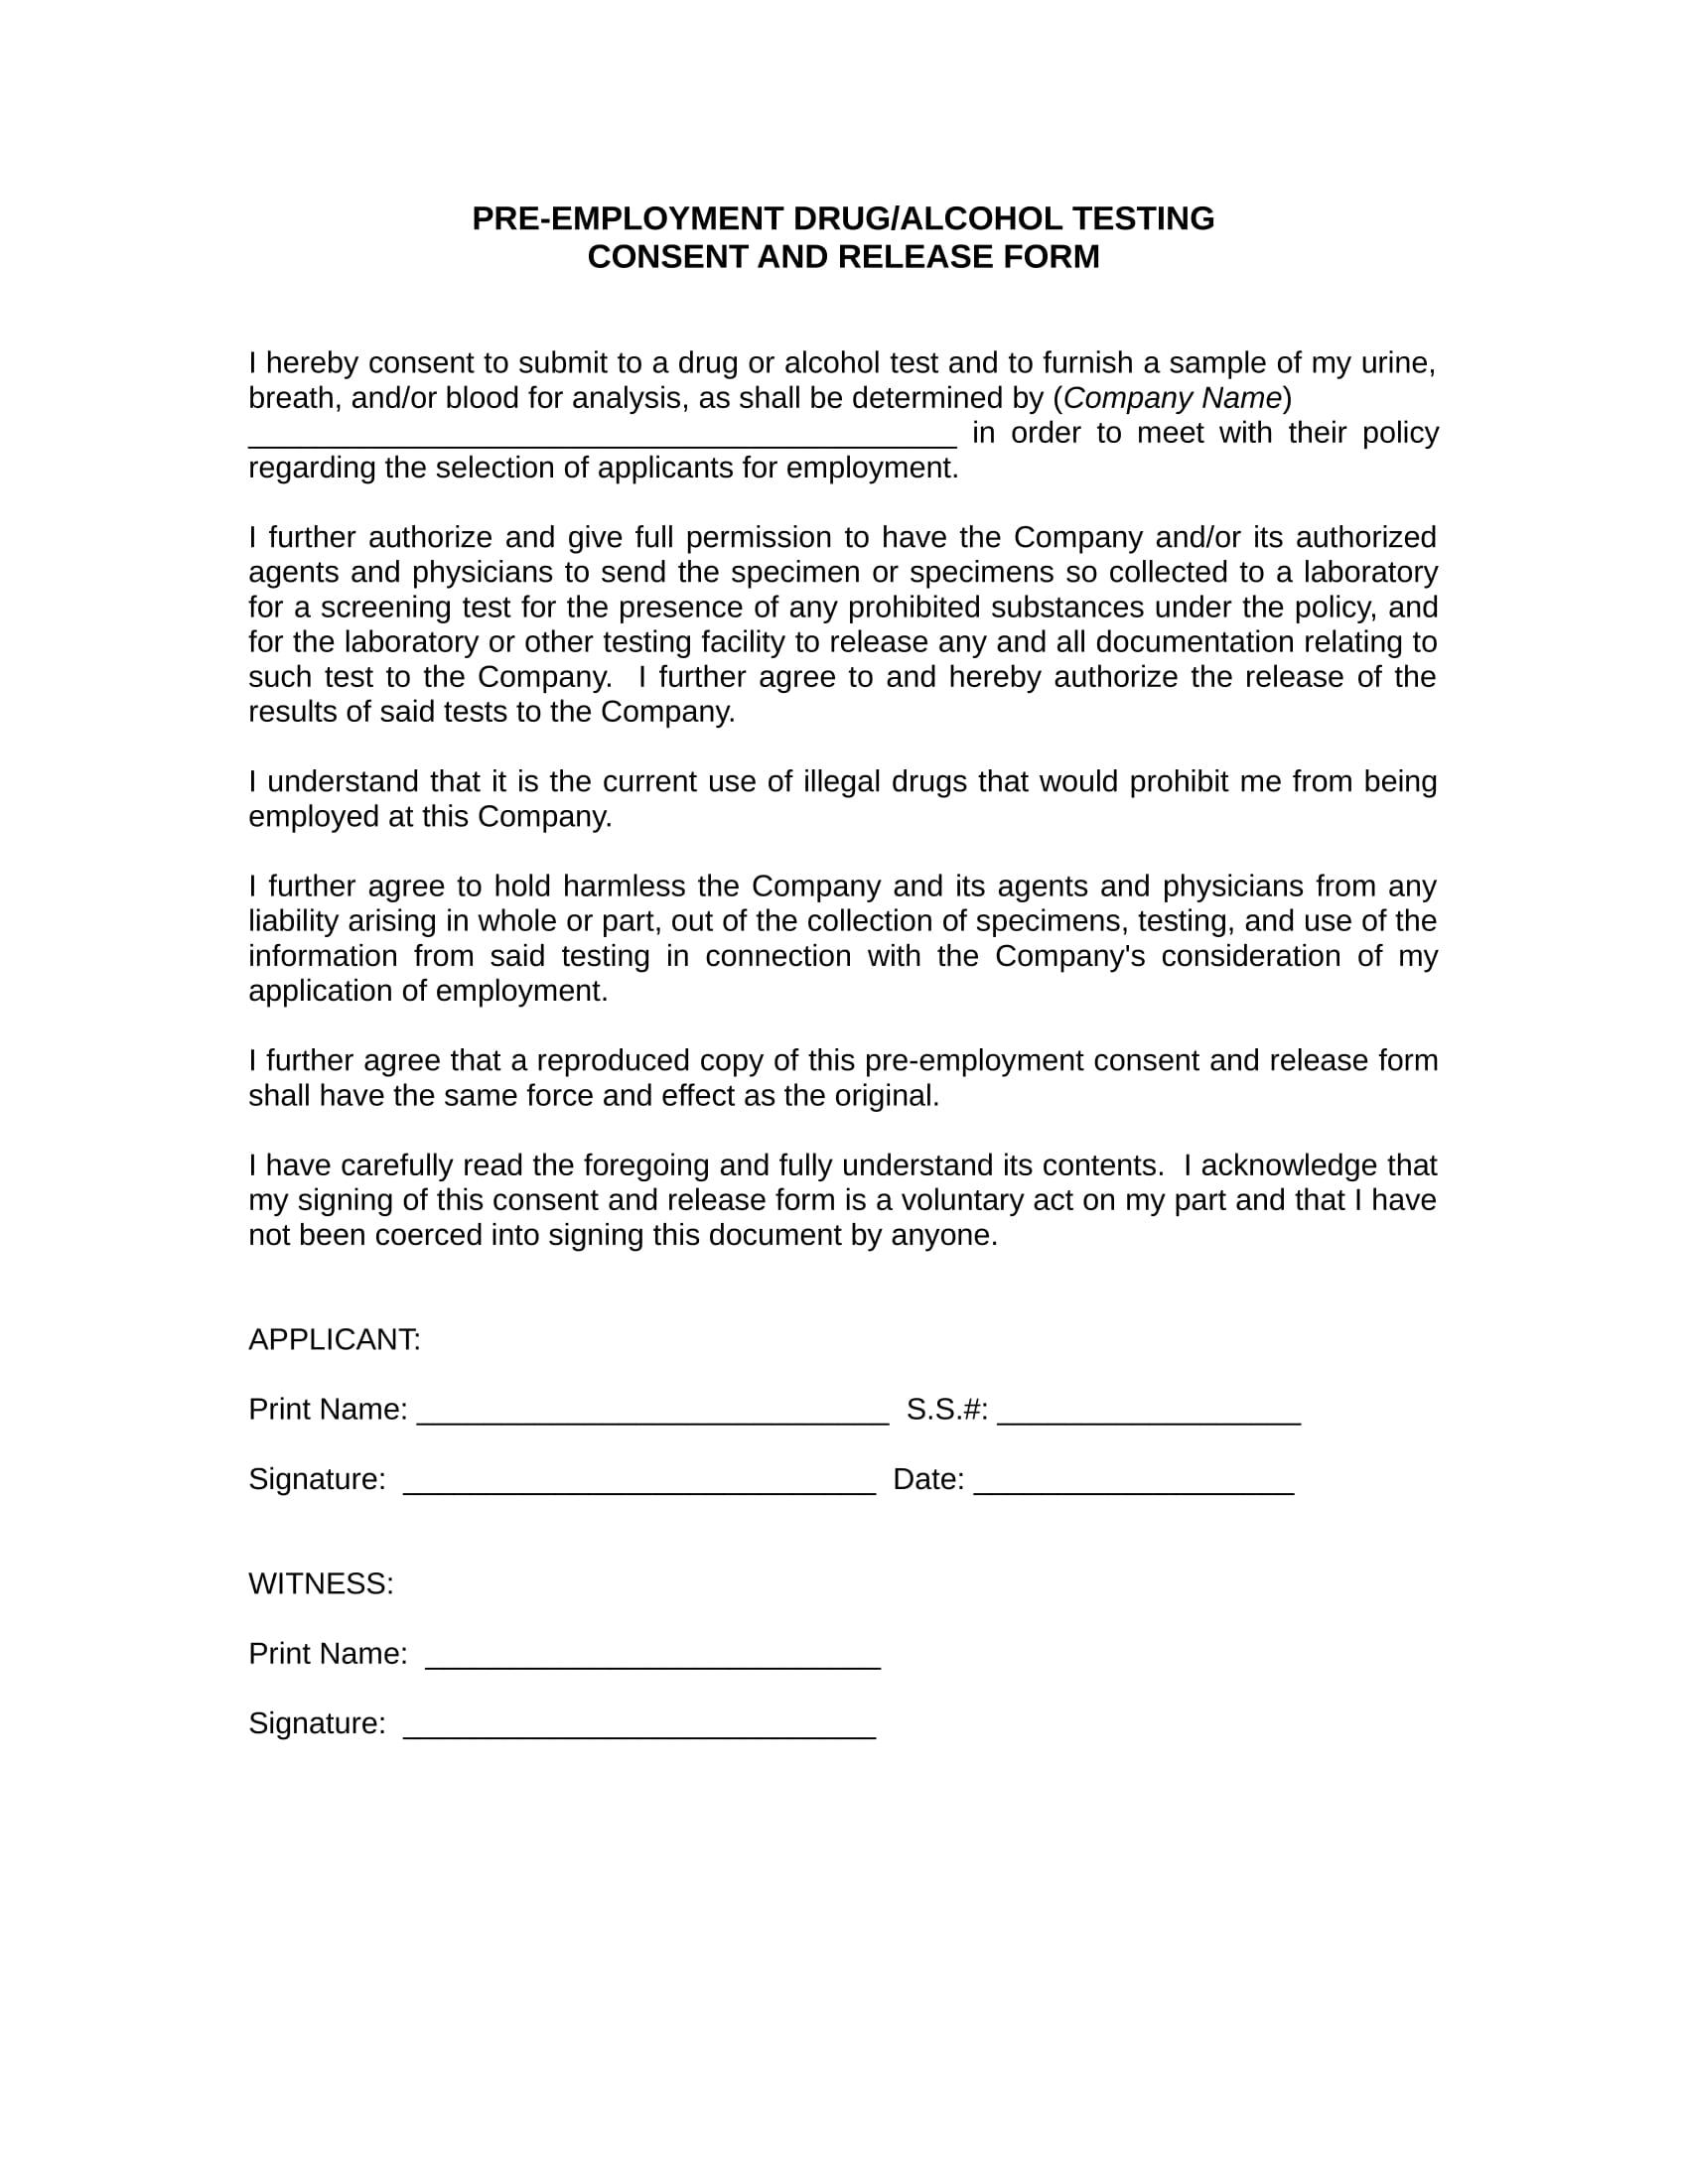 Pre Employment Drug Test Consent Form 1